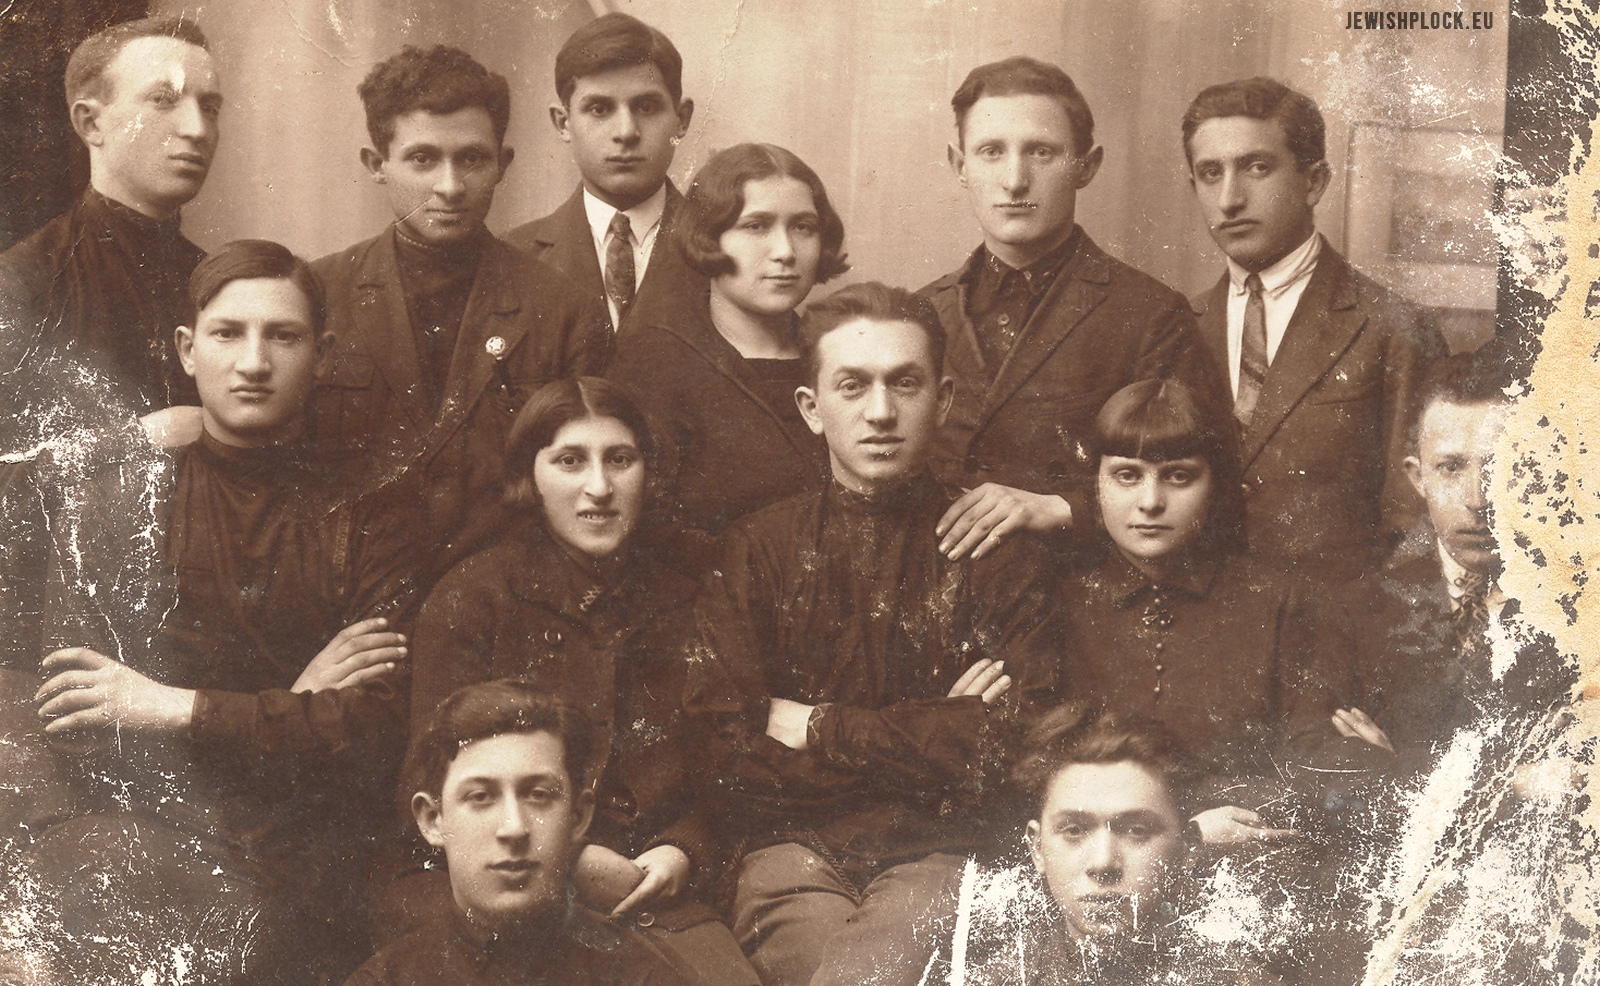 Hechaluc – Pioneer Jewish organization